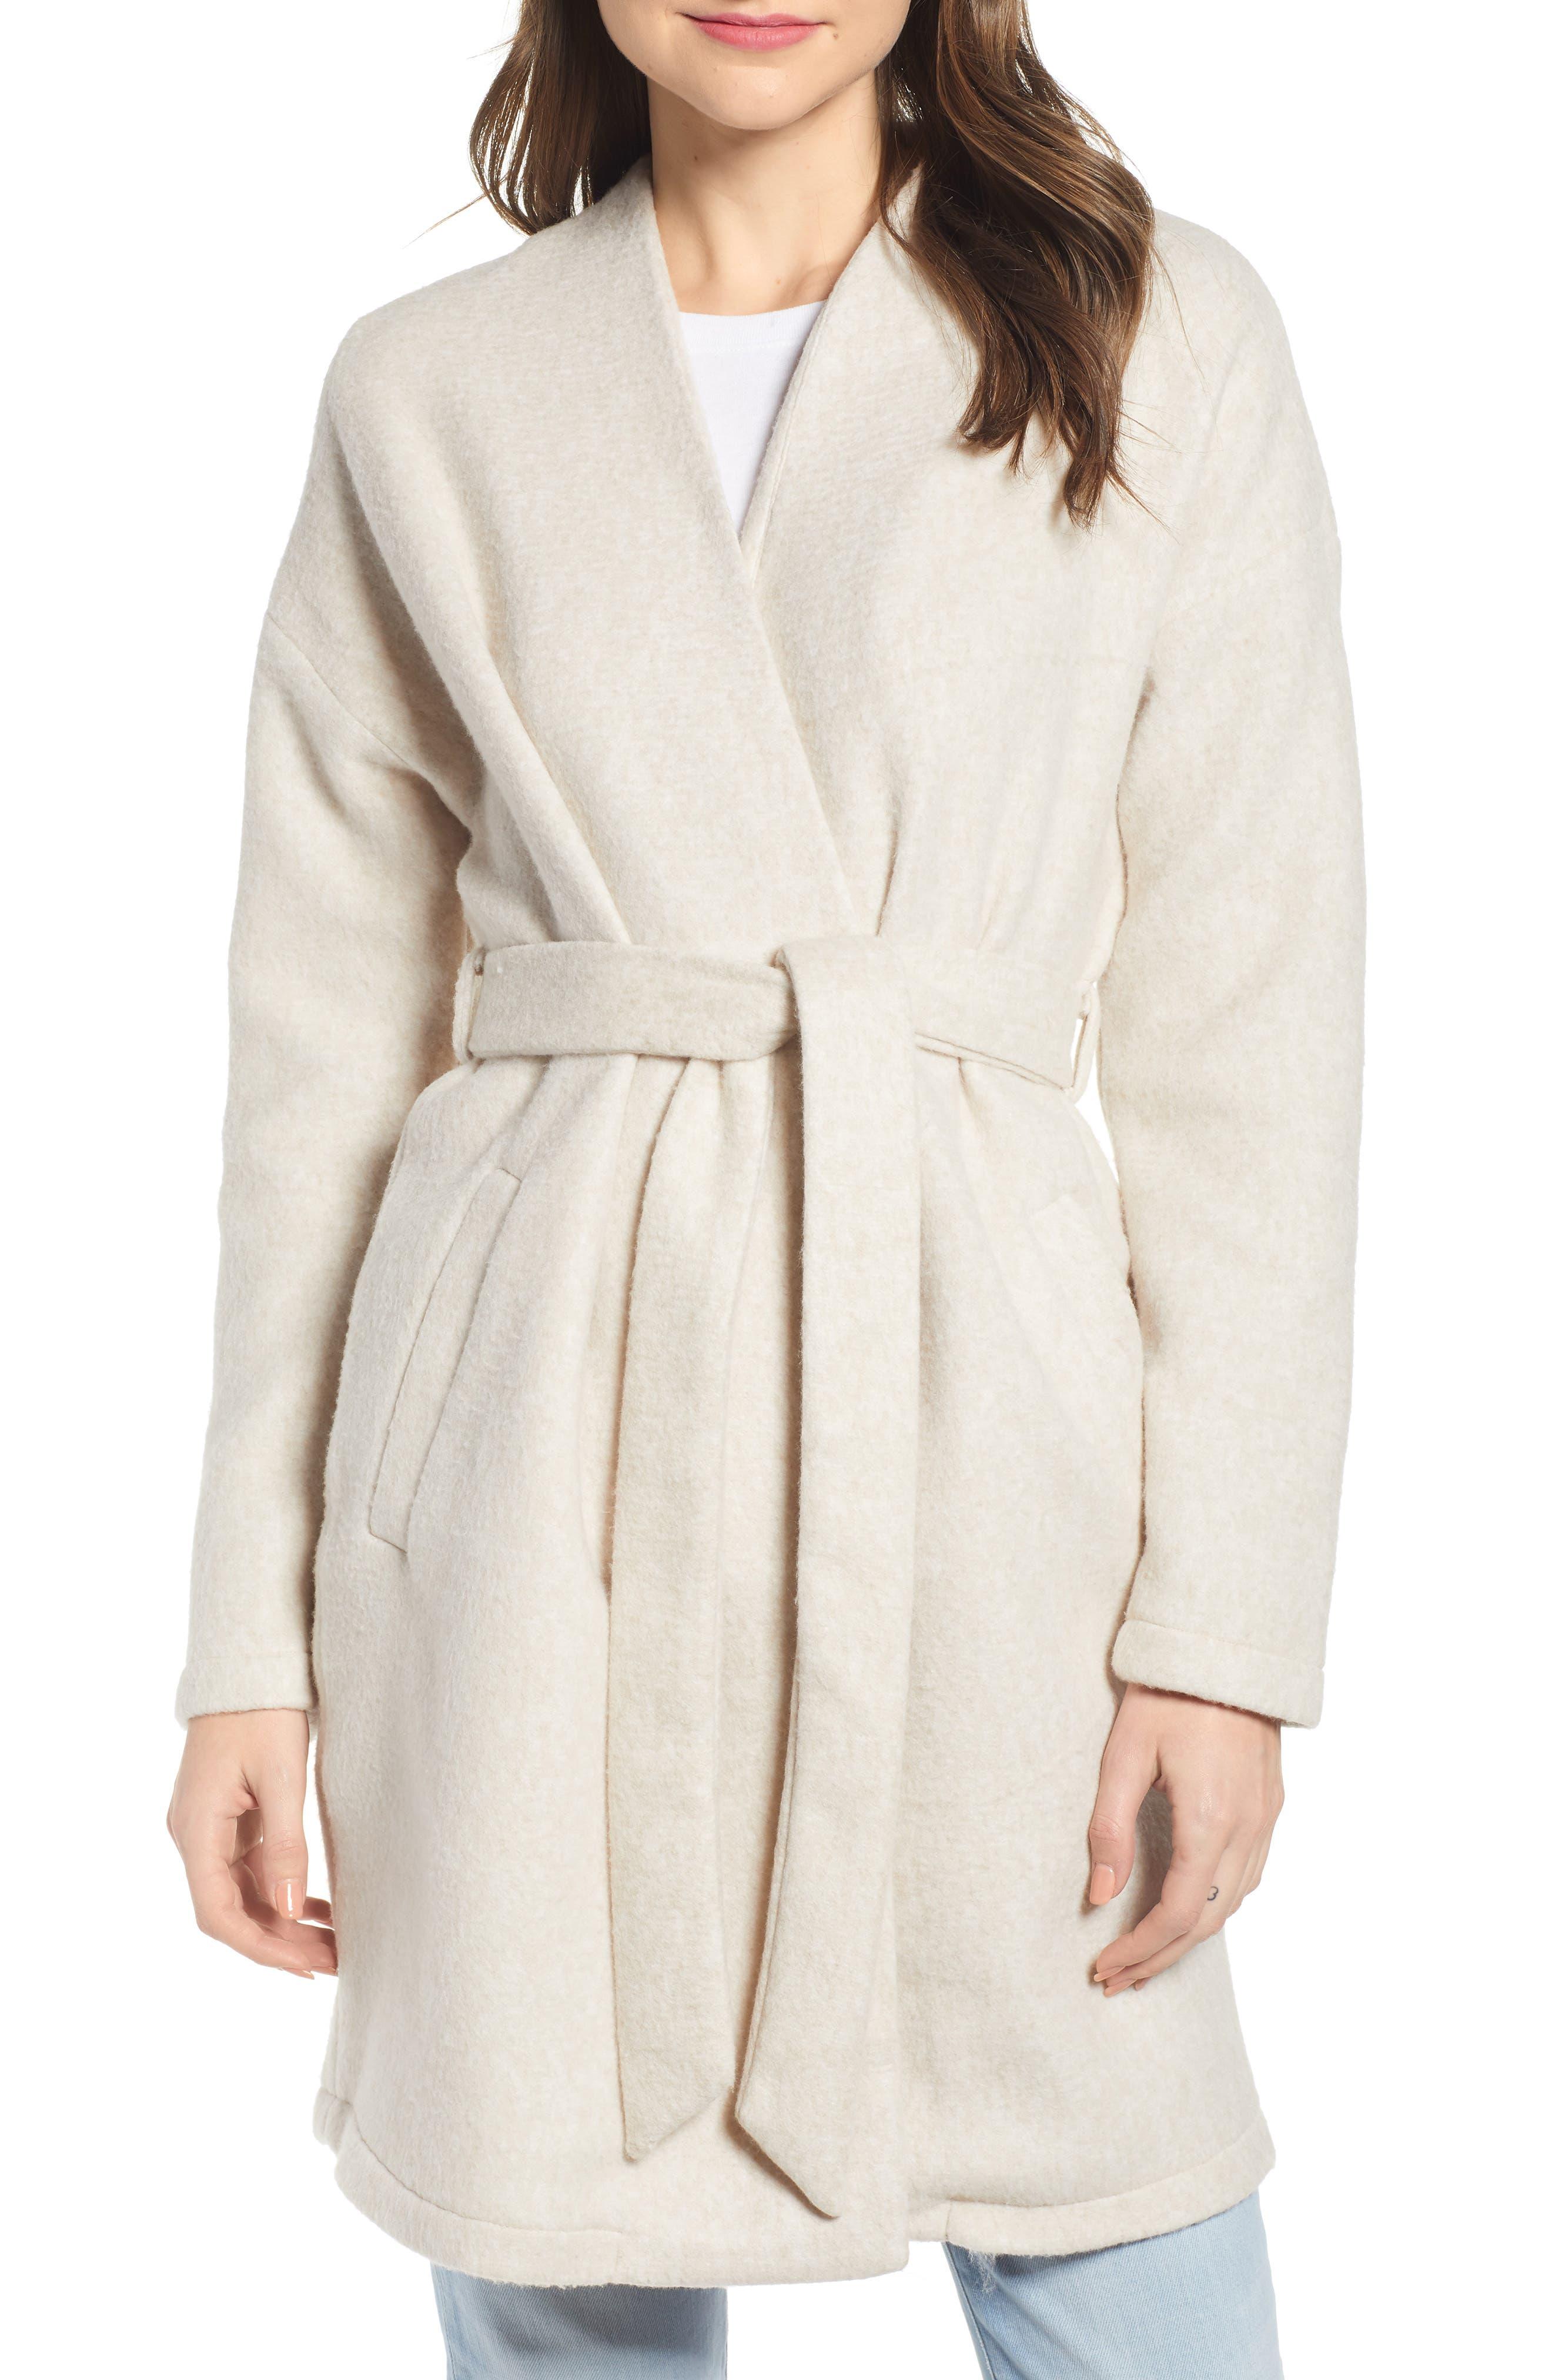 Vero Moda Brushed Fleece Jacket, Beige